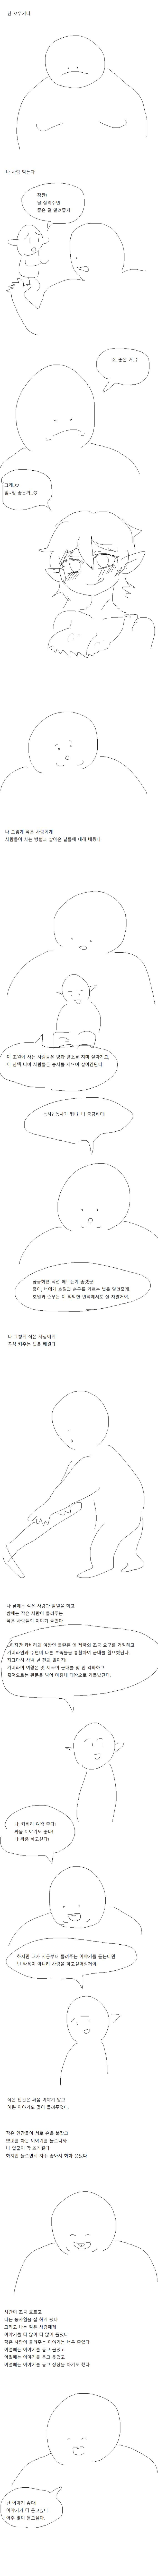 22bac223b49c28a8699fe8b115ef046c00a4aa180a